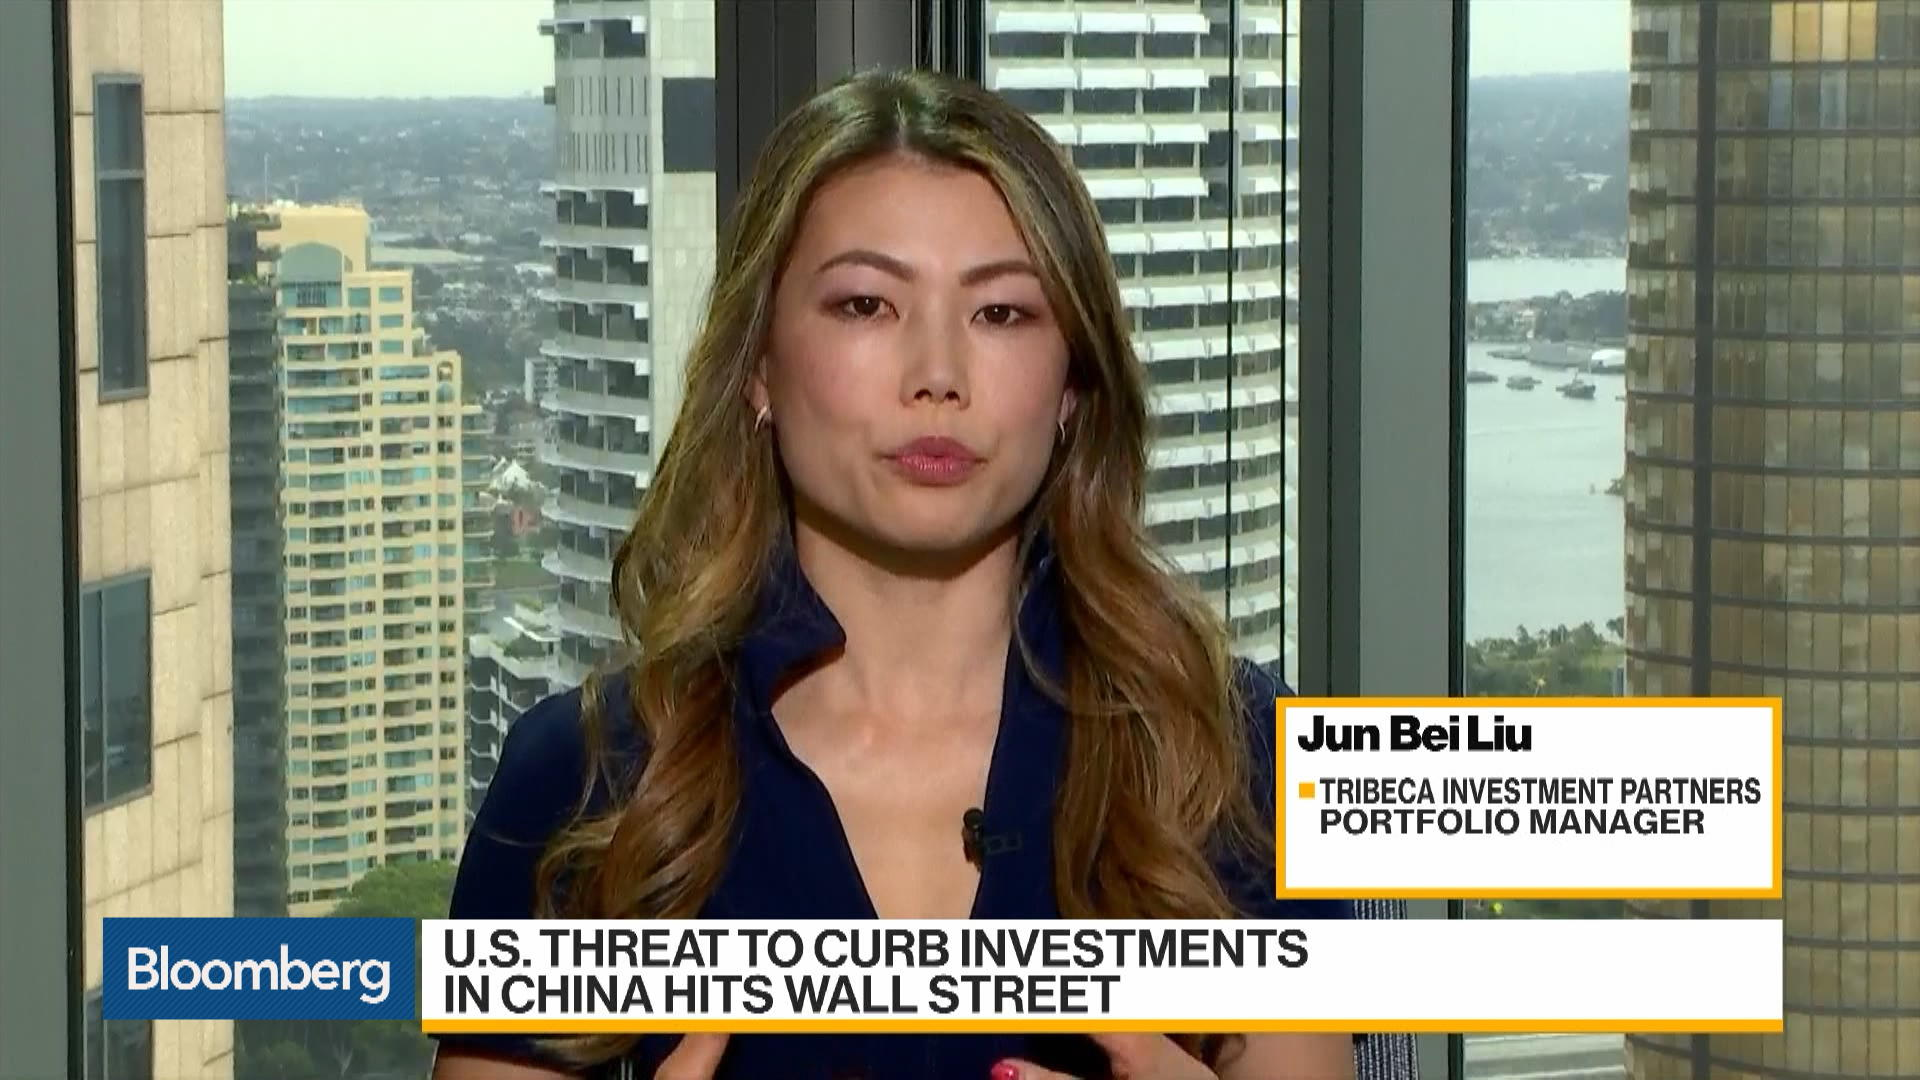 Jun Bei Liu, Portfolio Manager at Tribeca Investment, on Asian stocks, Australia Reserve Bank Policy